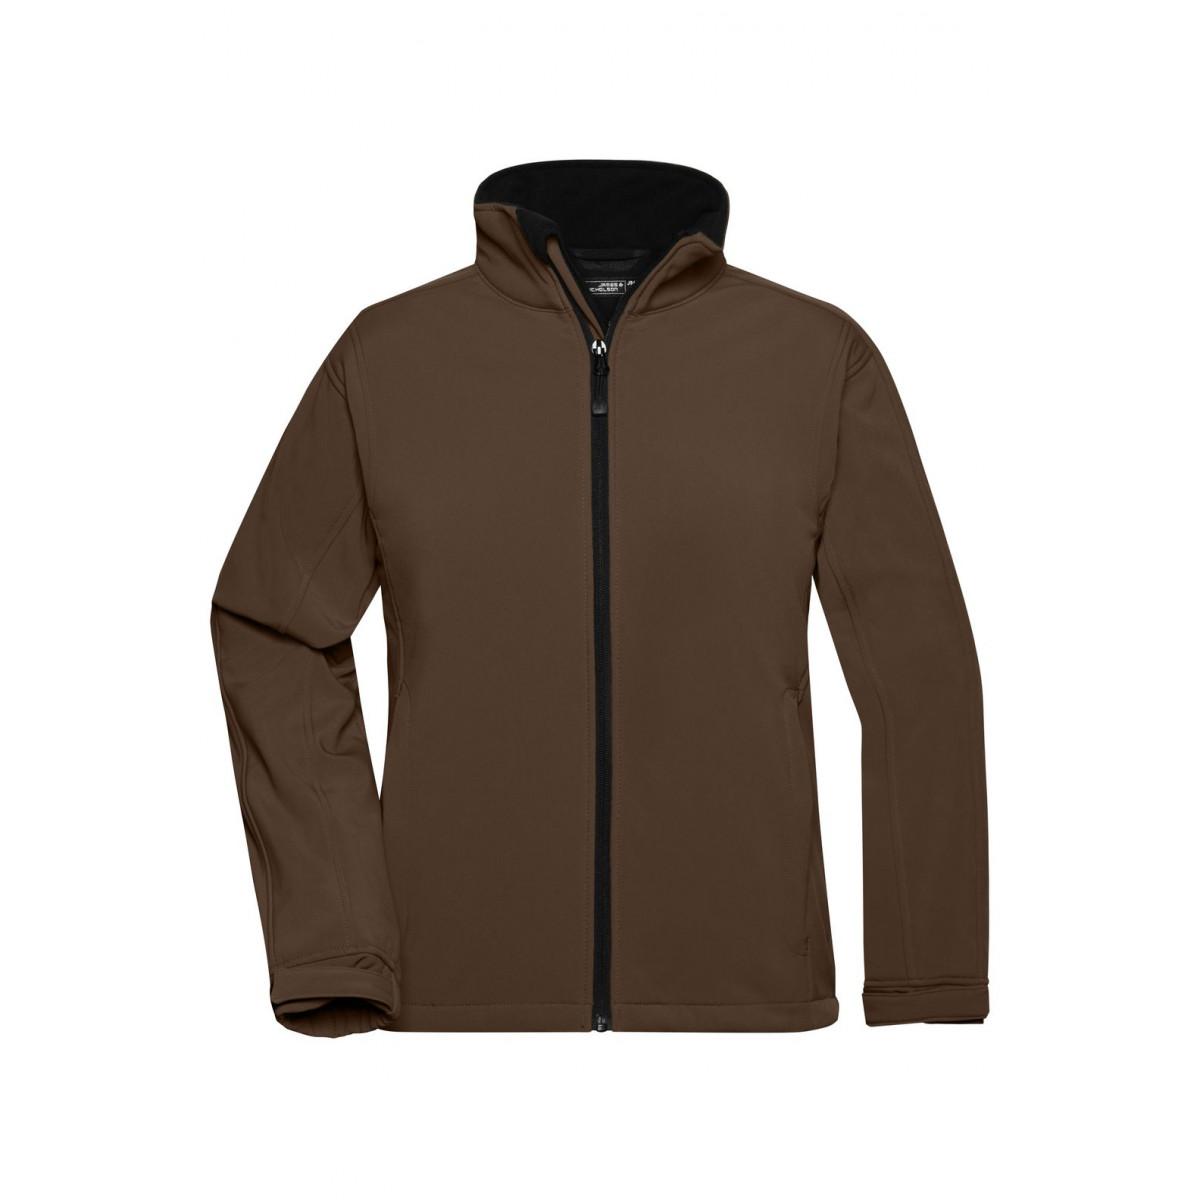 Куртка женская JN137 Ladies Softshell Jacket - Коричневый